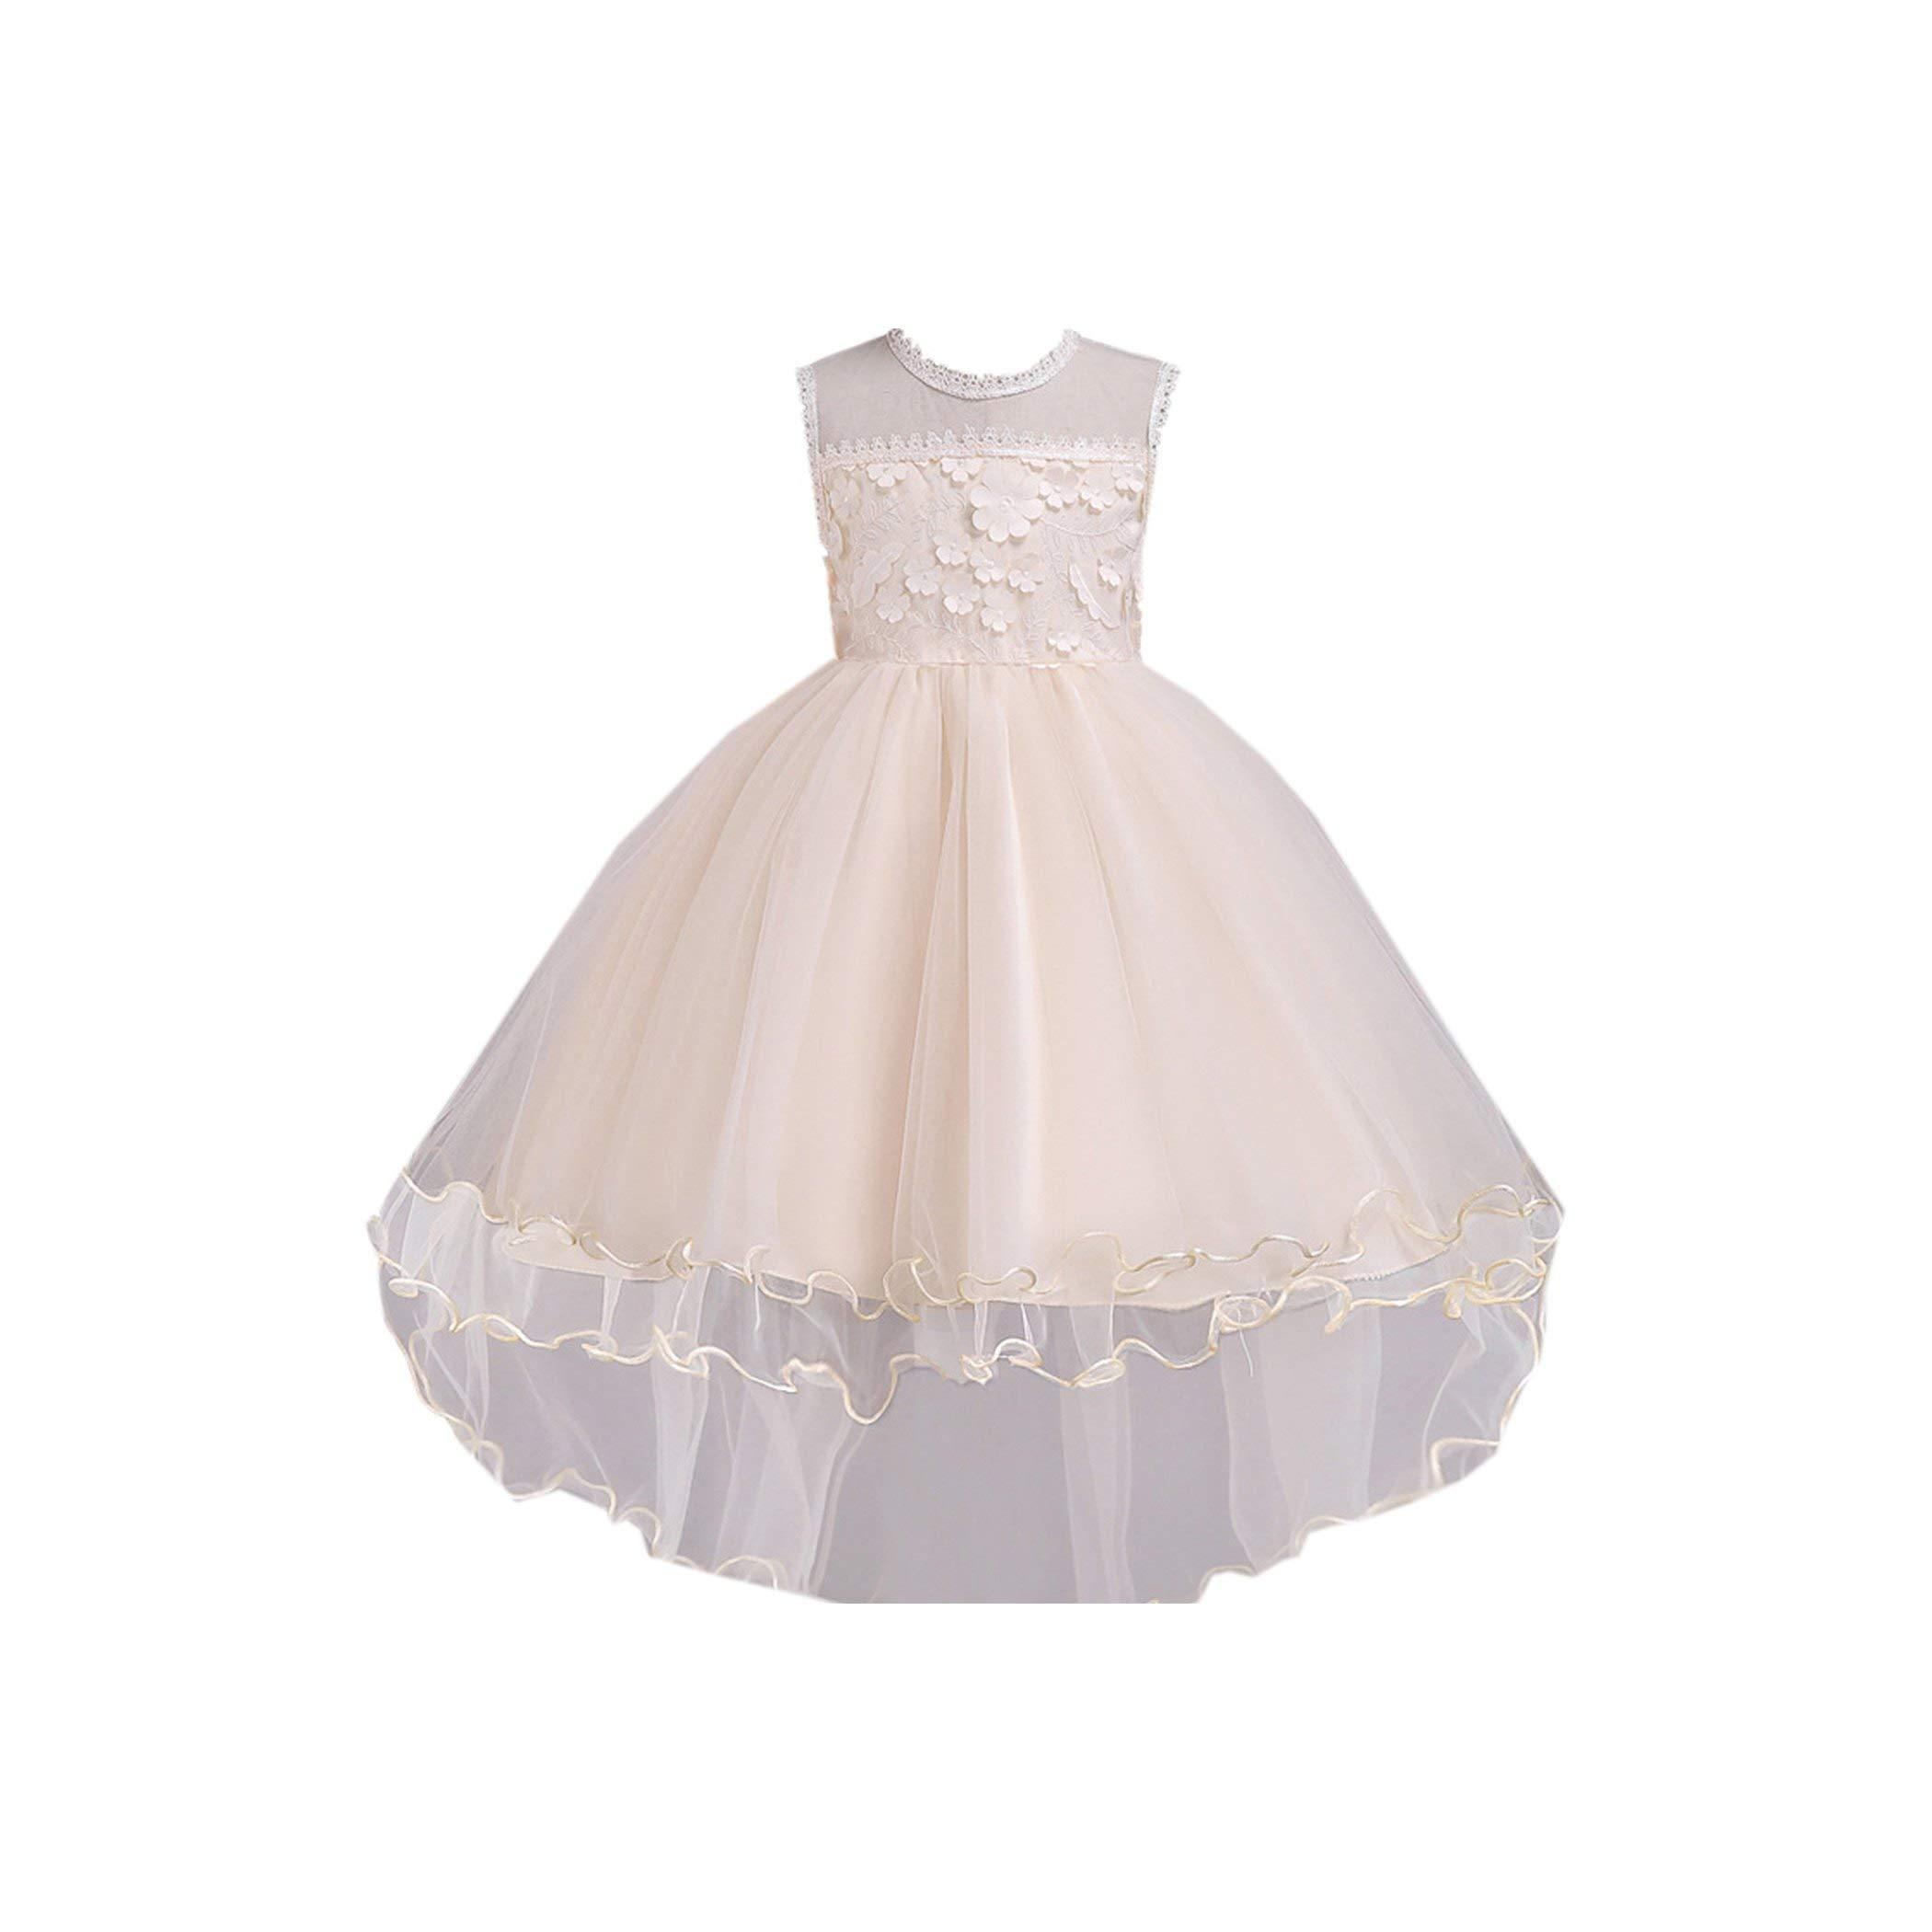 New Summer Baby Girls Party Dress Evening Wear Long Tail Girls Clothes Elegant Flower Girl Dress,30,8